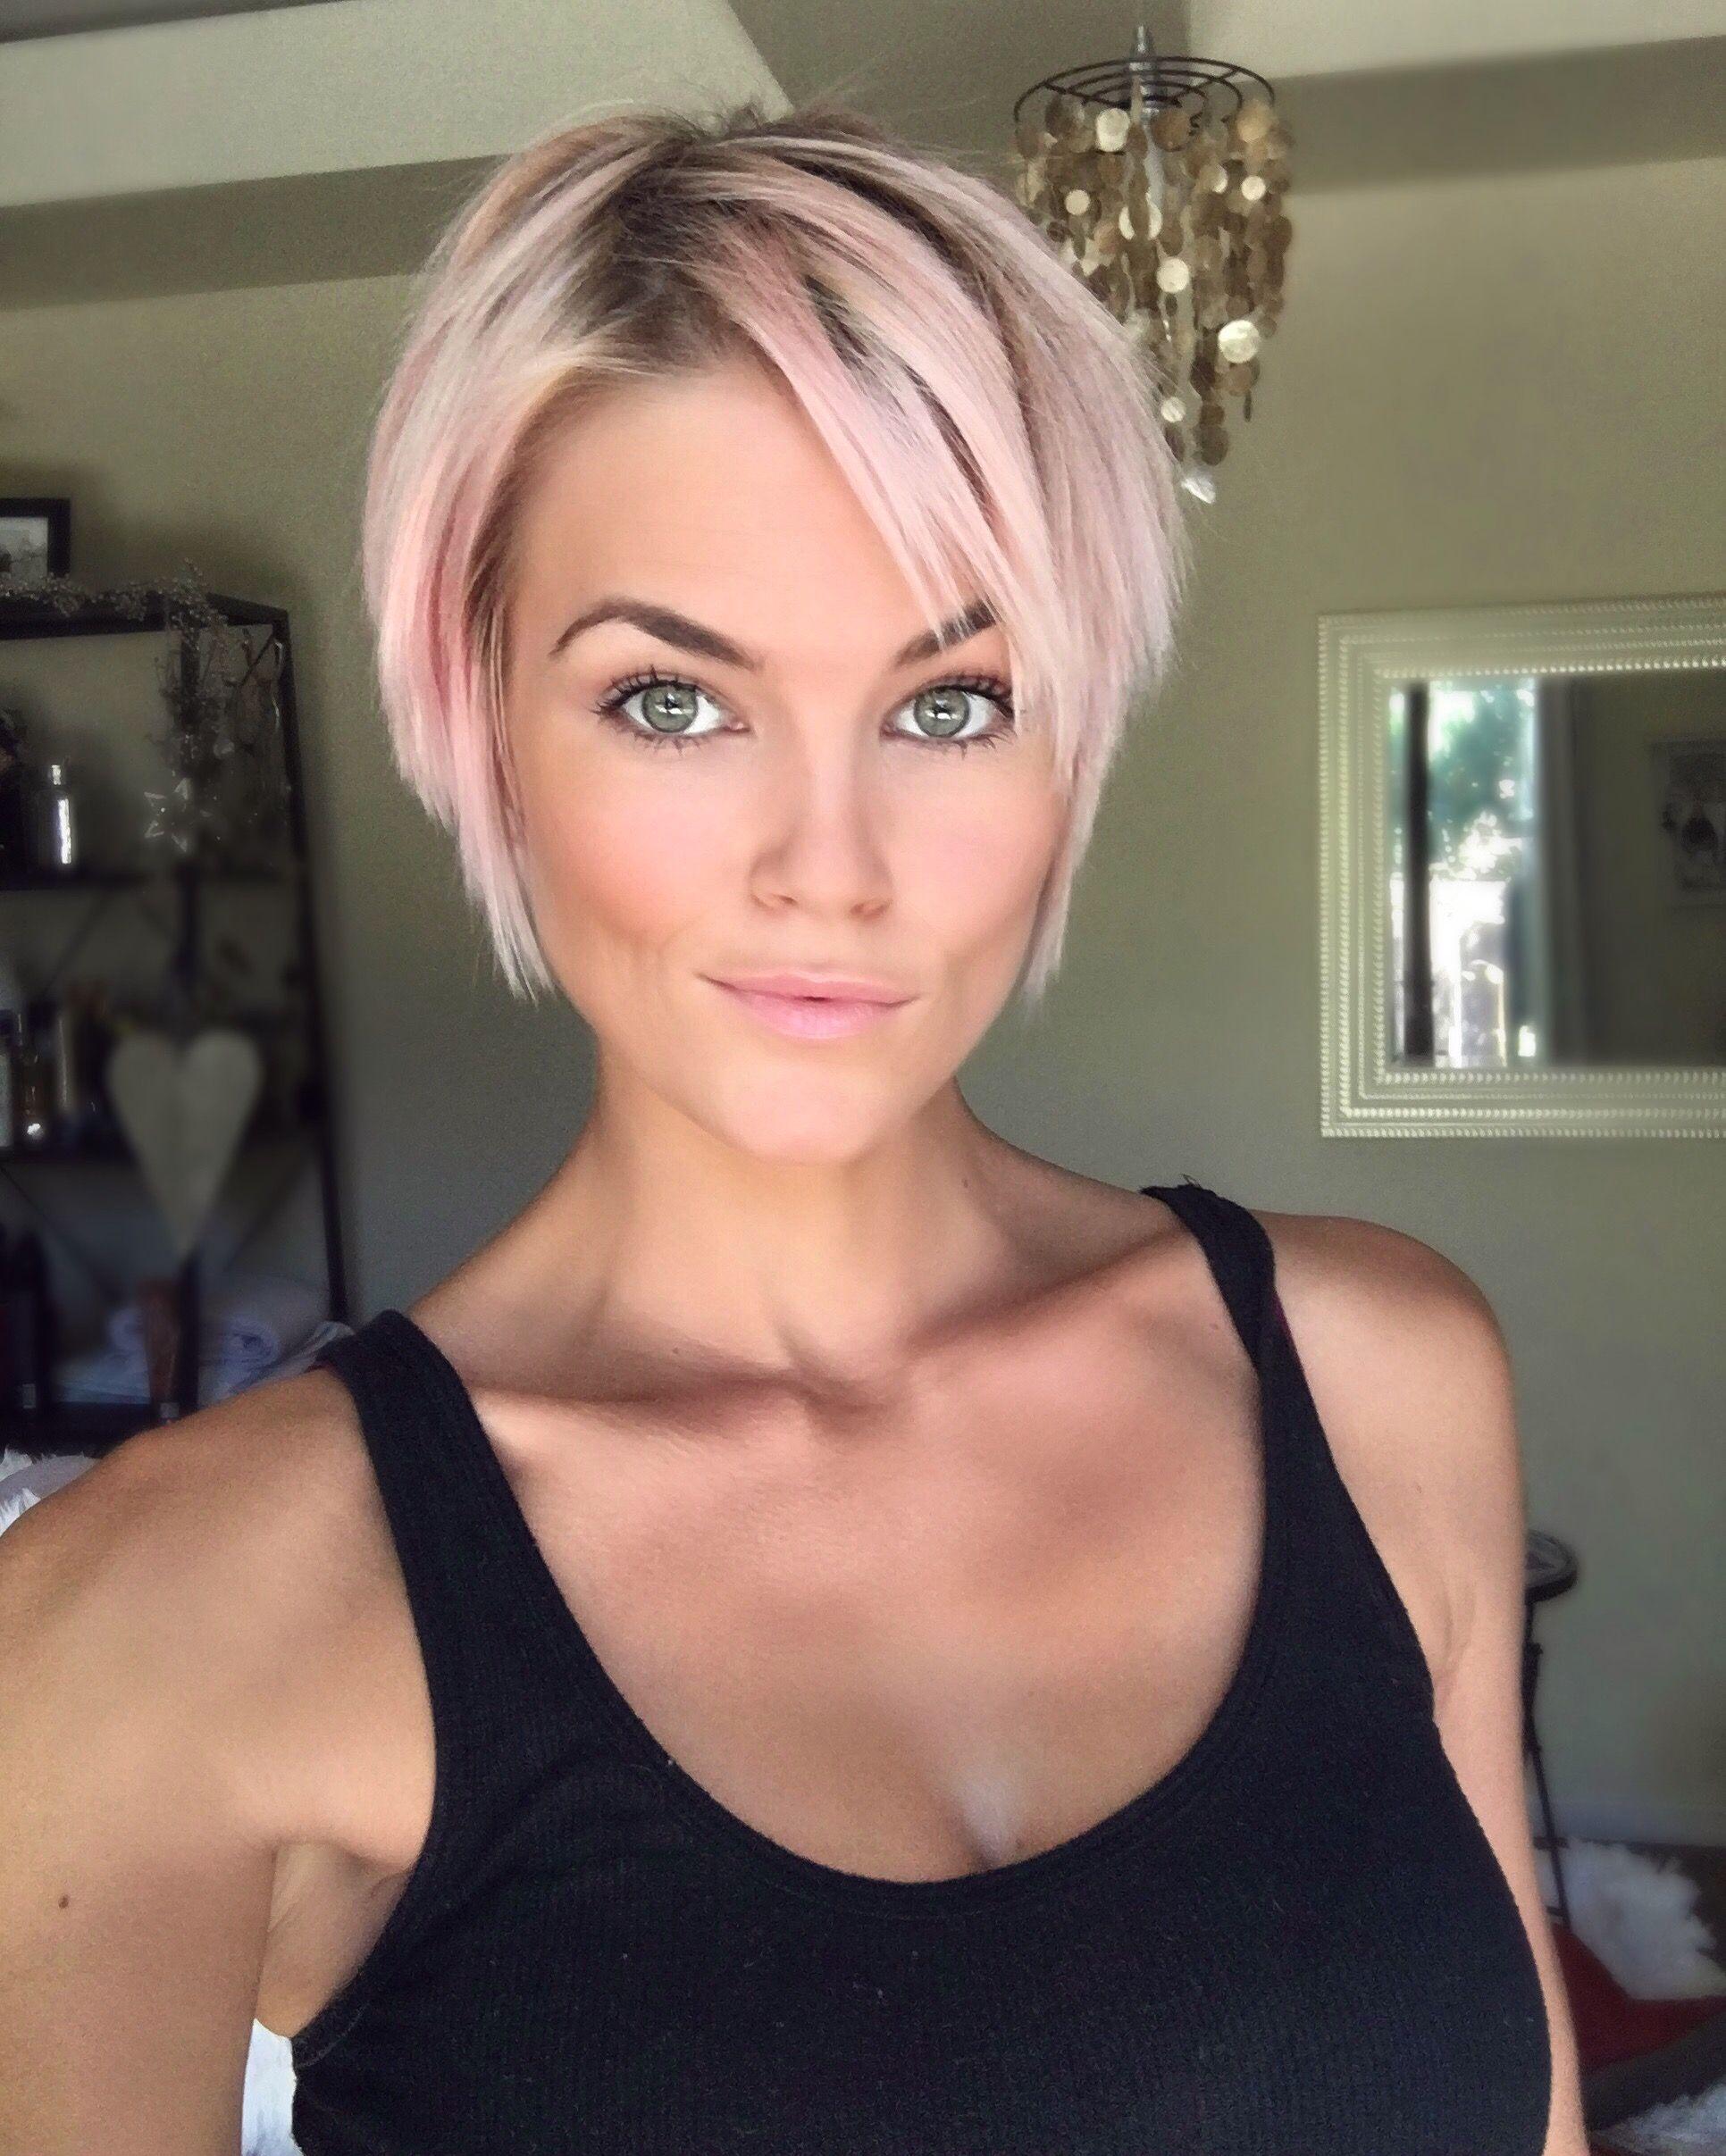 Short hair images